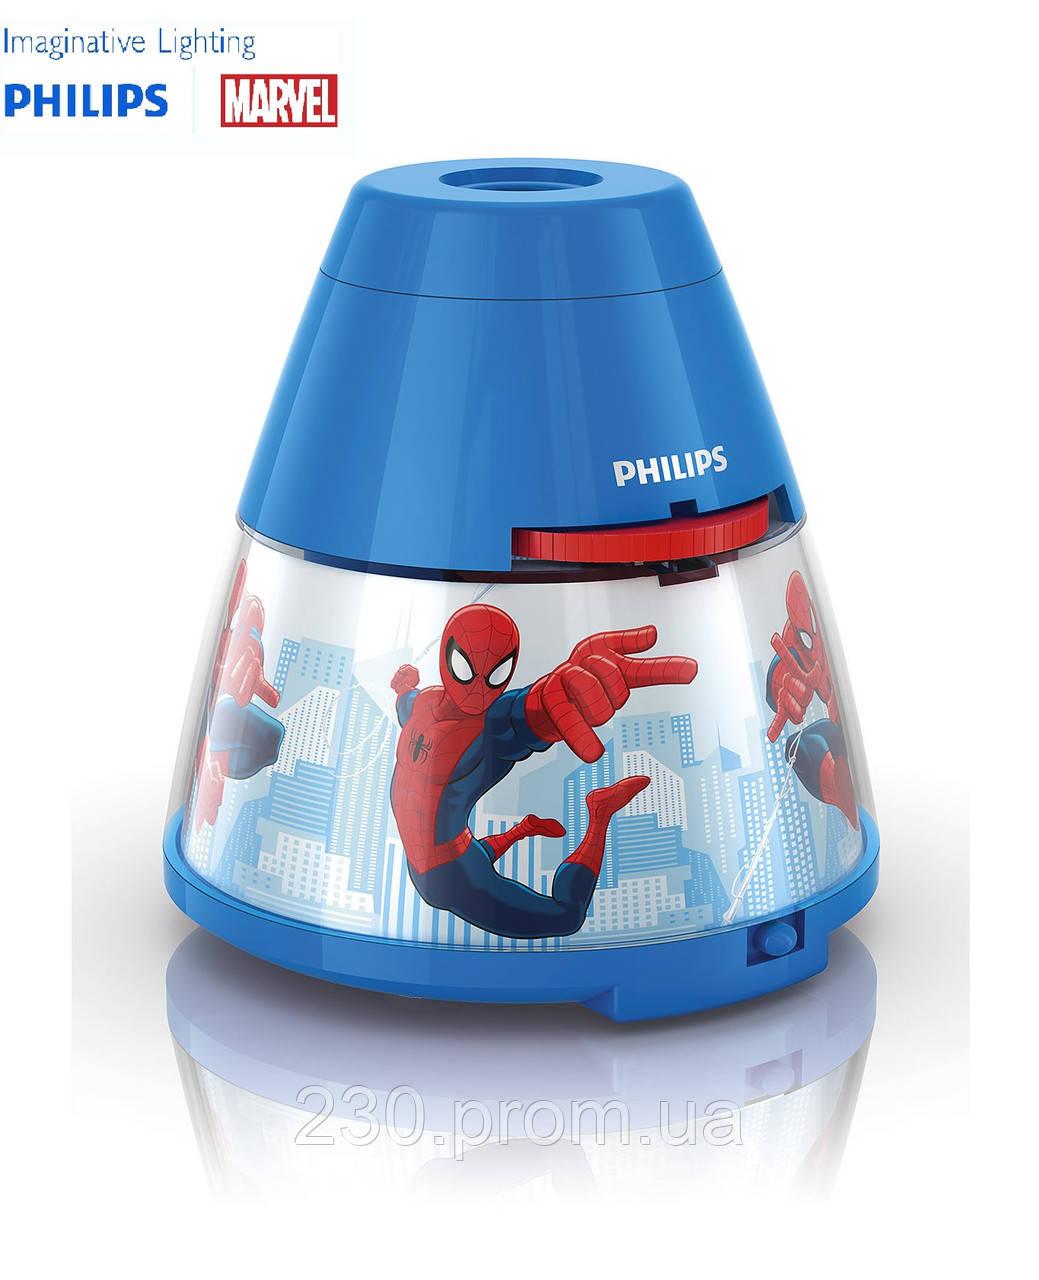 Ночник-проектор 2-в-1 Philips Marvel spiderman